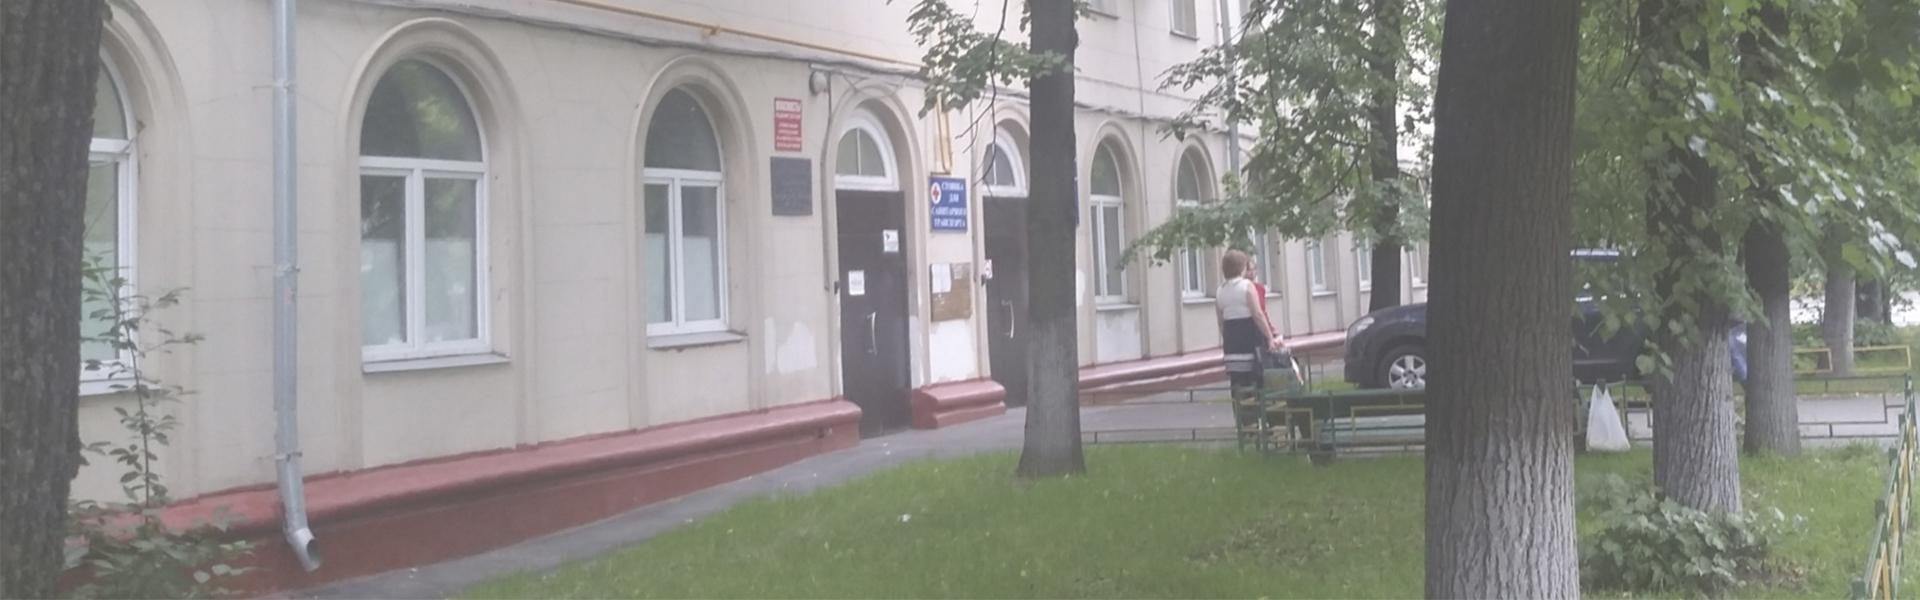 Больница адлер адреса